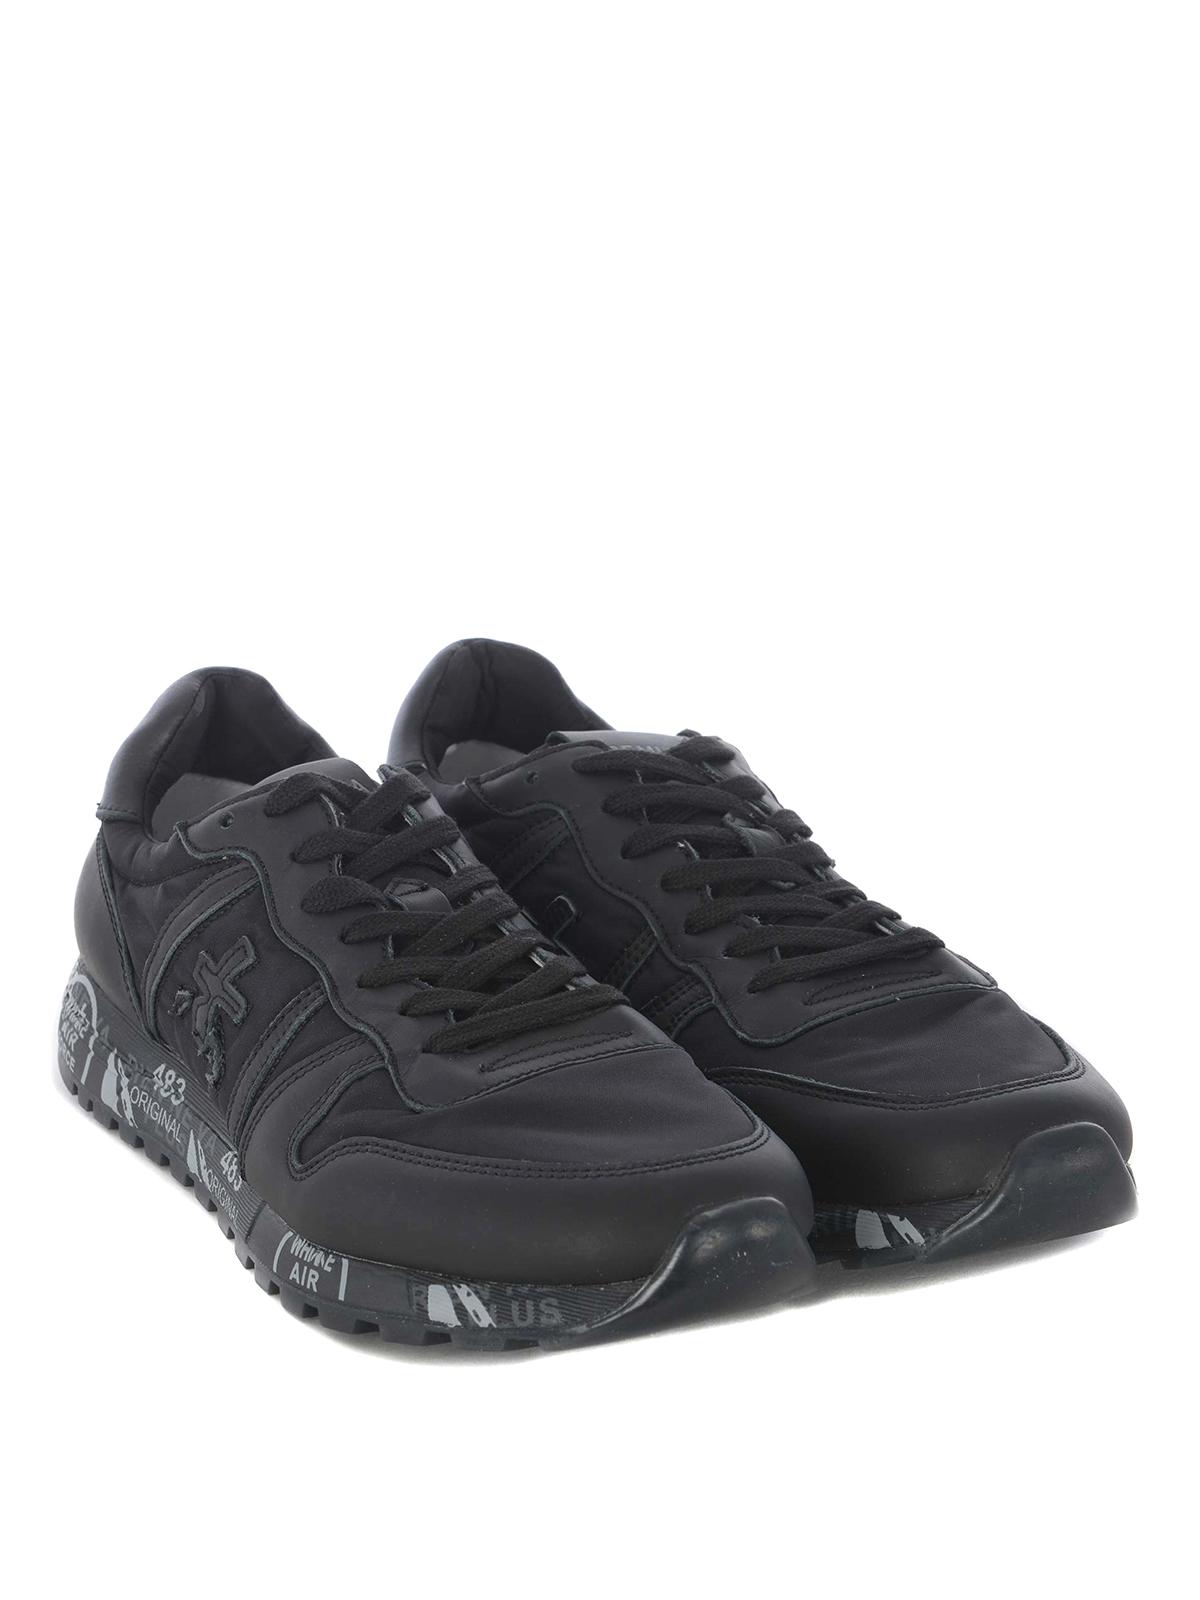 Sneakers uomo Premiata in pelle e nylon